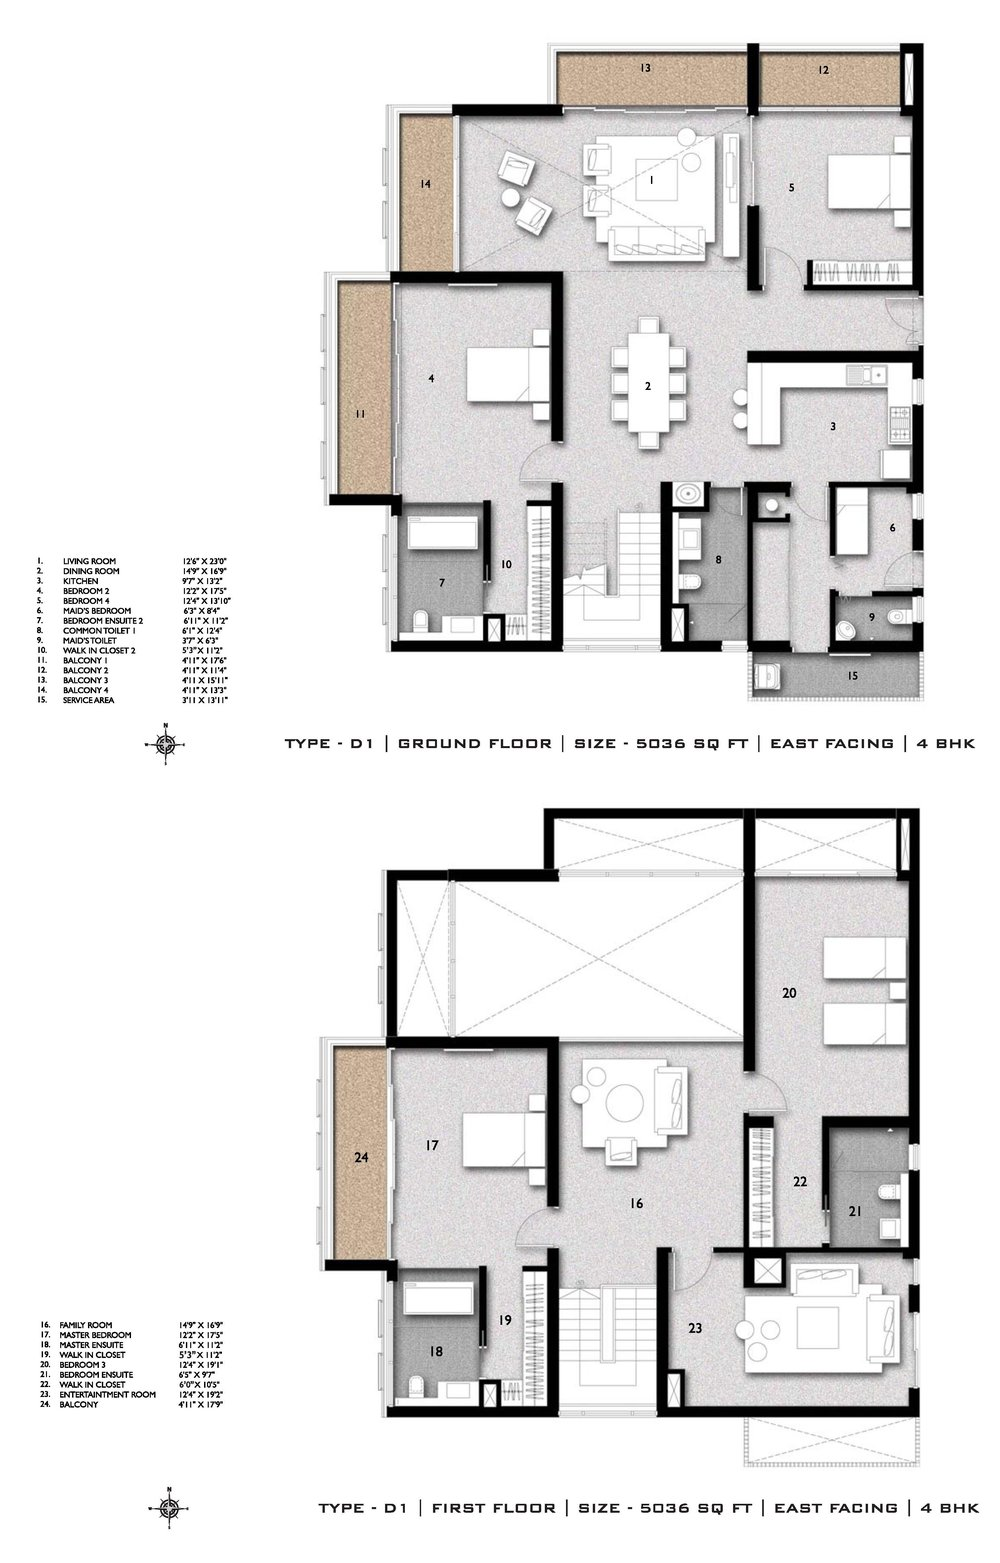 Duplex_5036 sft.jpg